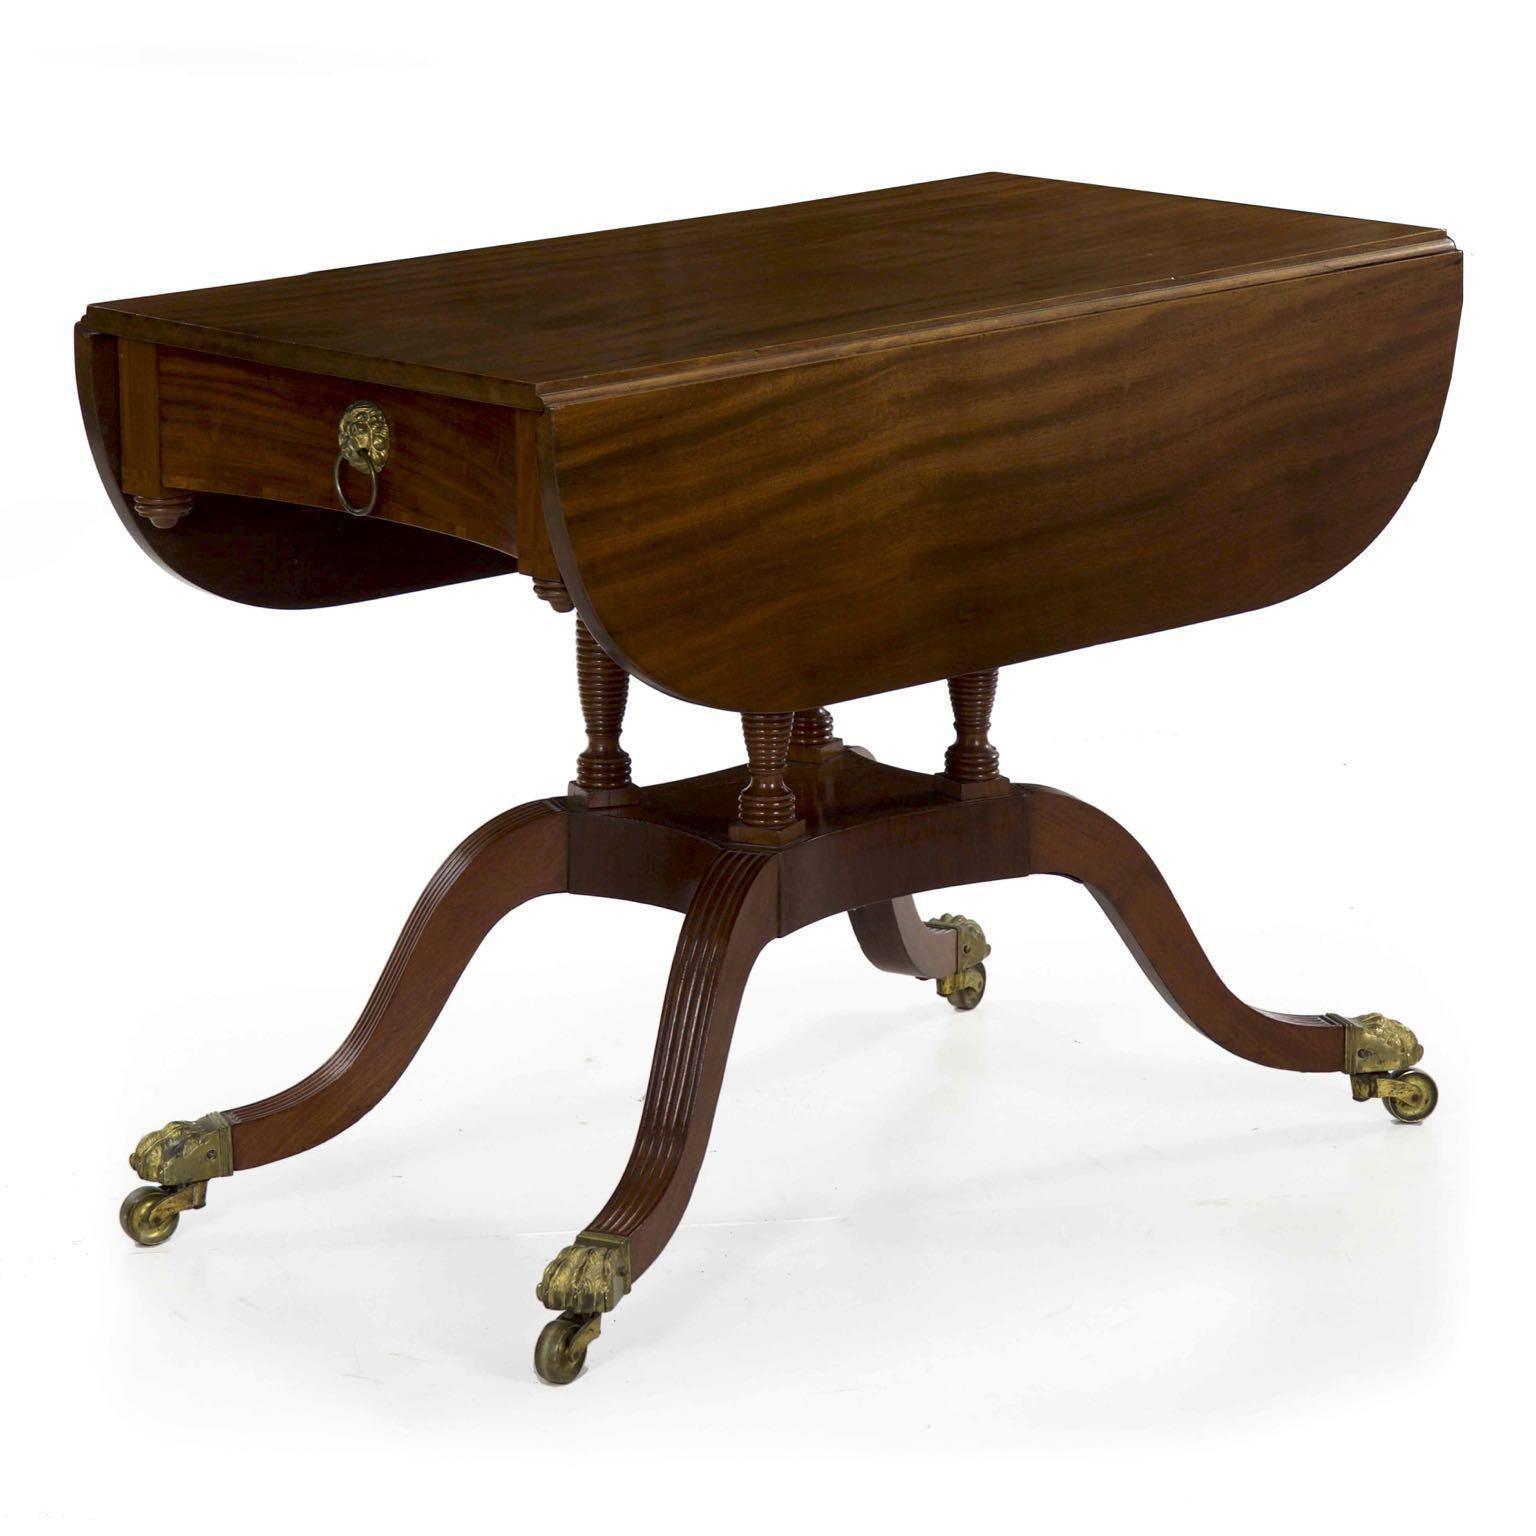 Circa 1815 American Classical Mahogany Breakfast Table Mahogany